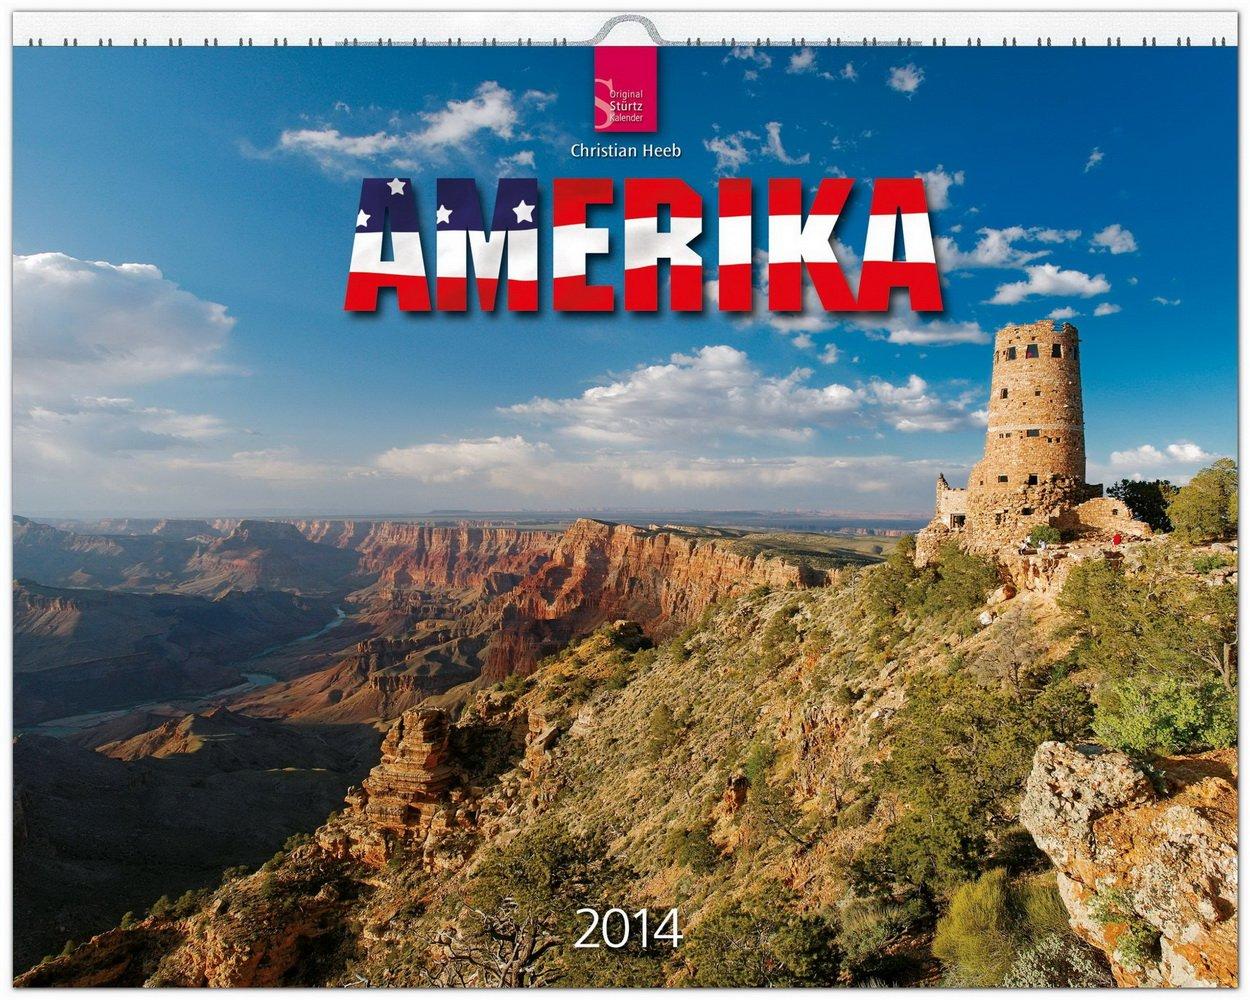 Amerika 2014: Original Stürtz-Kalender - Großformat-Kalender 60 x 48 cm [Spiralbindung]